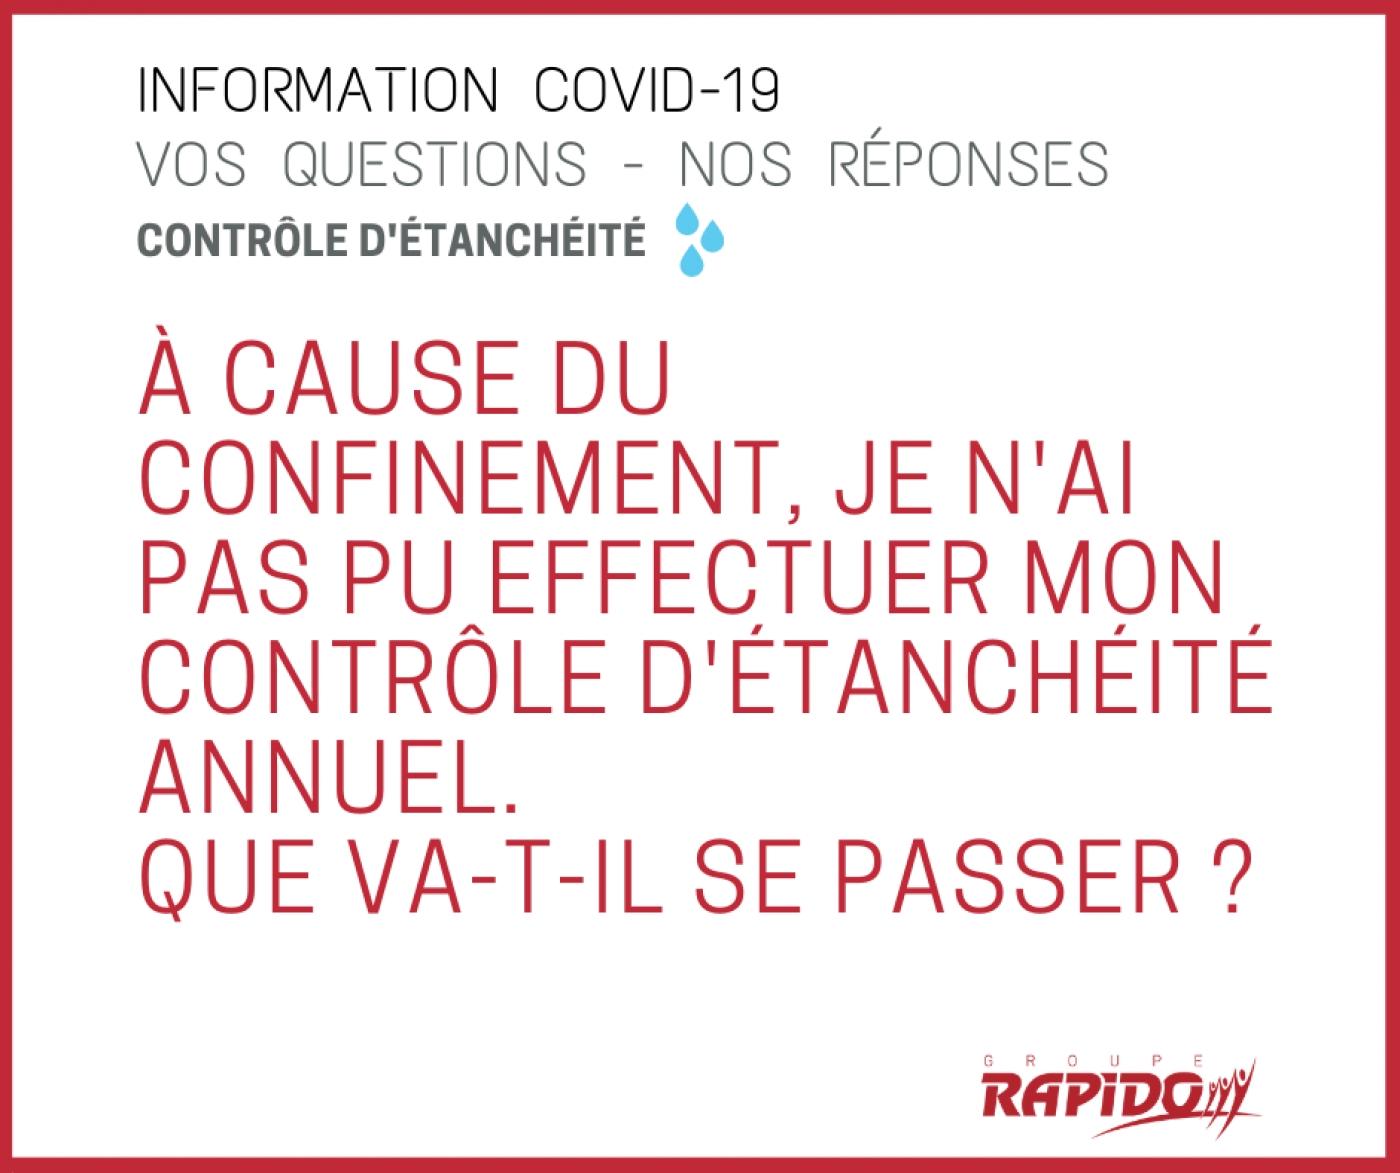 Groupe RAPIDO - Information COVID-19 CORONAVIRUS